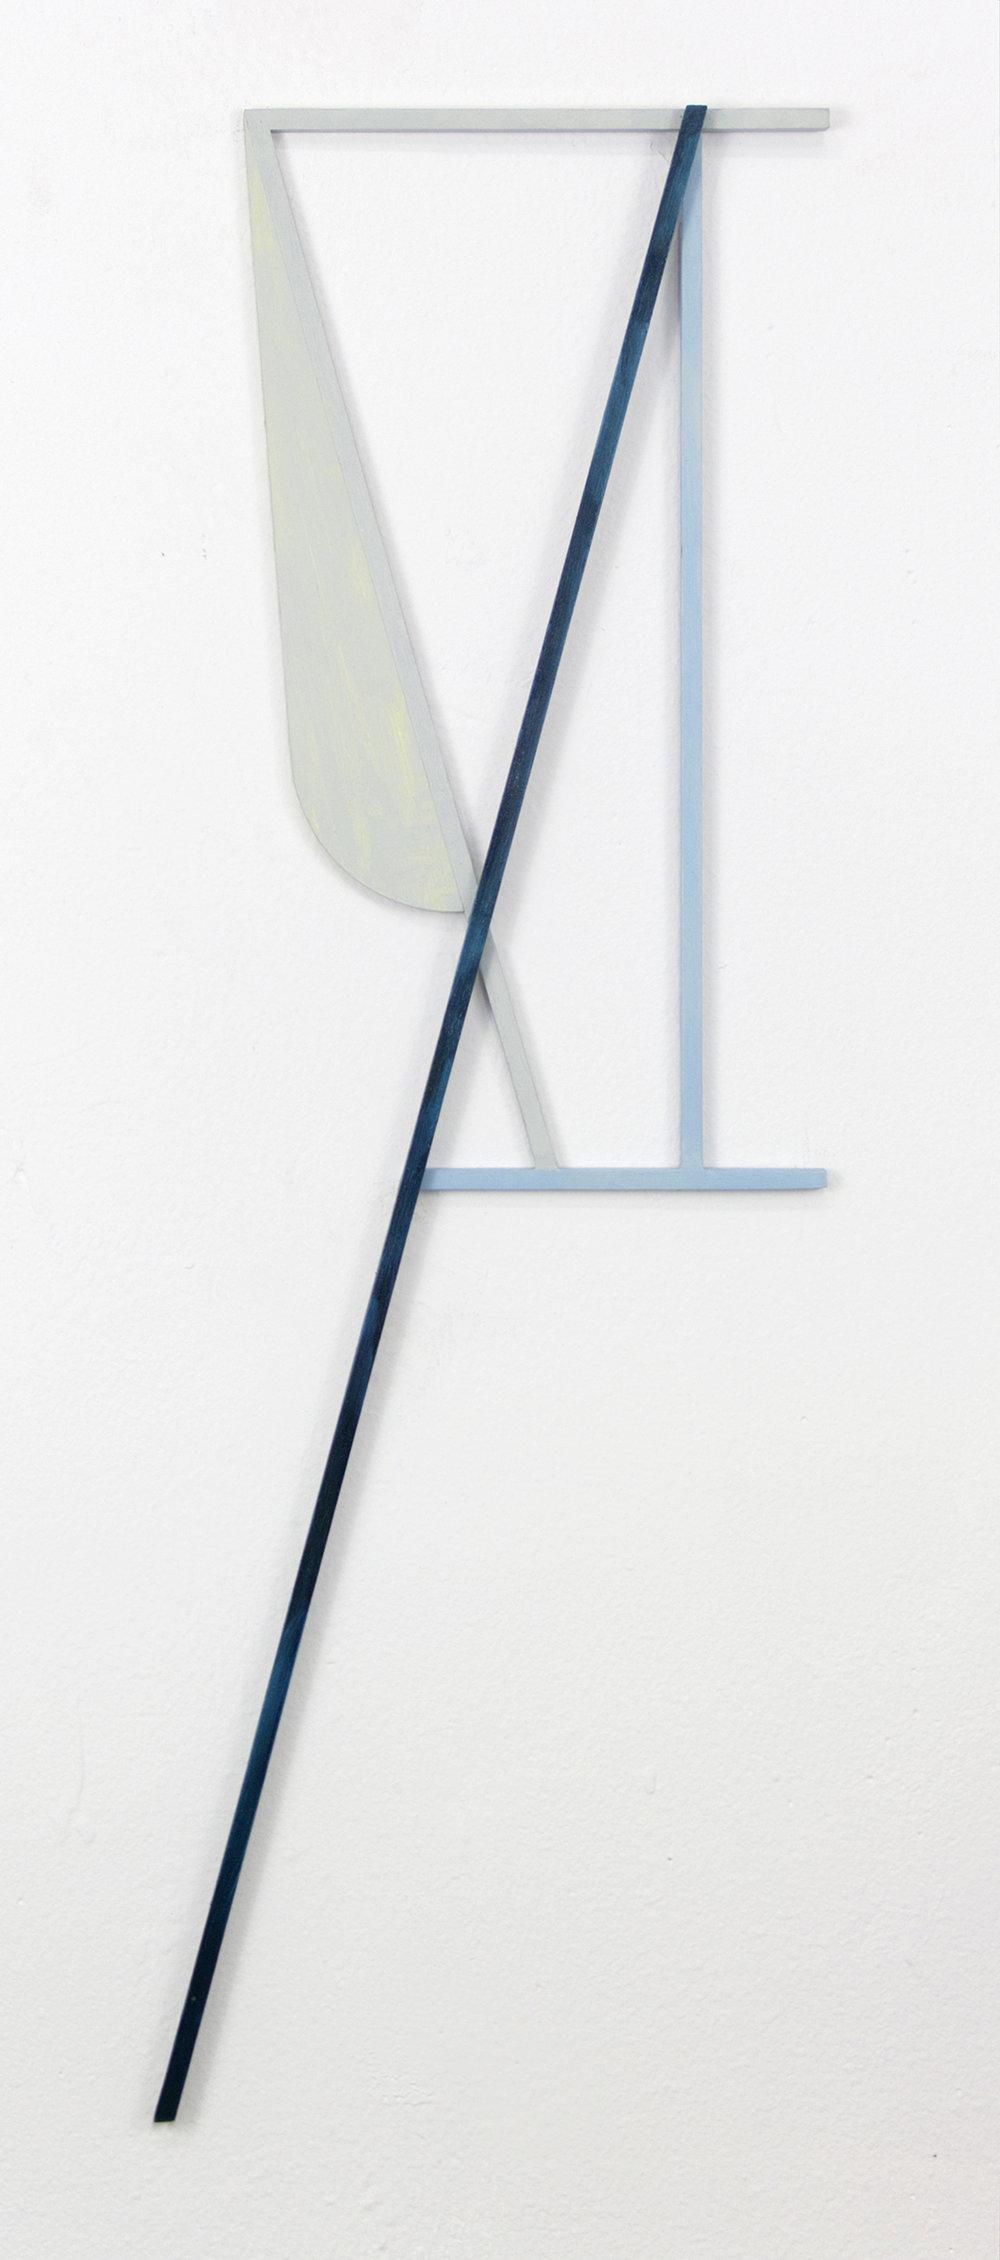 "JONATHAN RUNCIO   Untitled (JR02-17) , oil on steel, 25"" x 8.5"", 2017"